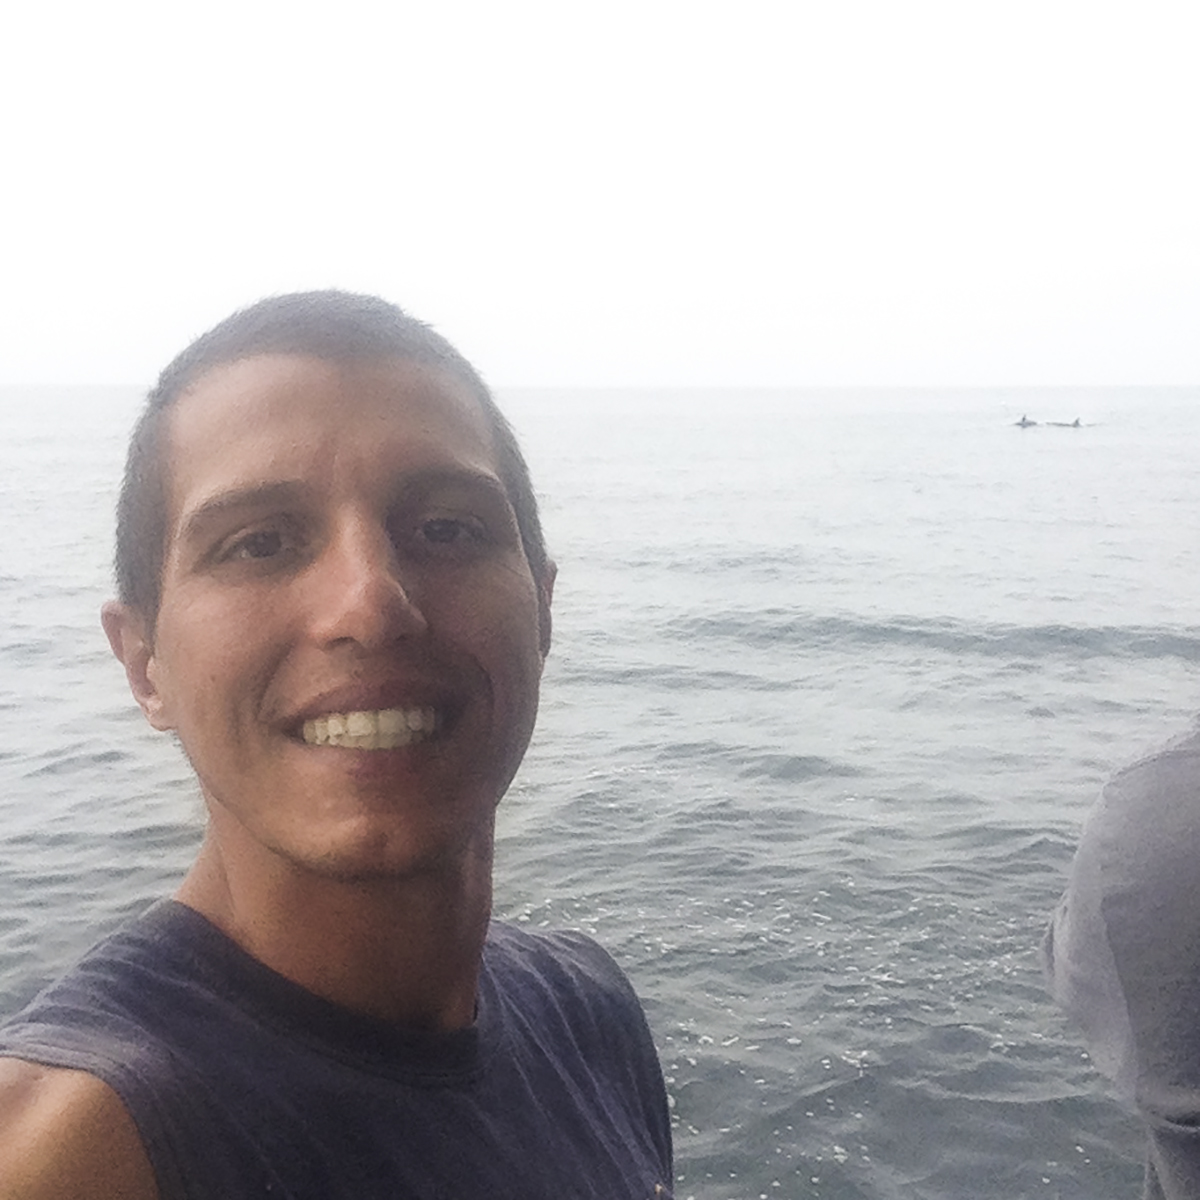 DM Felipe's Orca Selfie